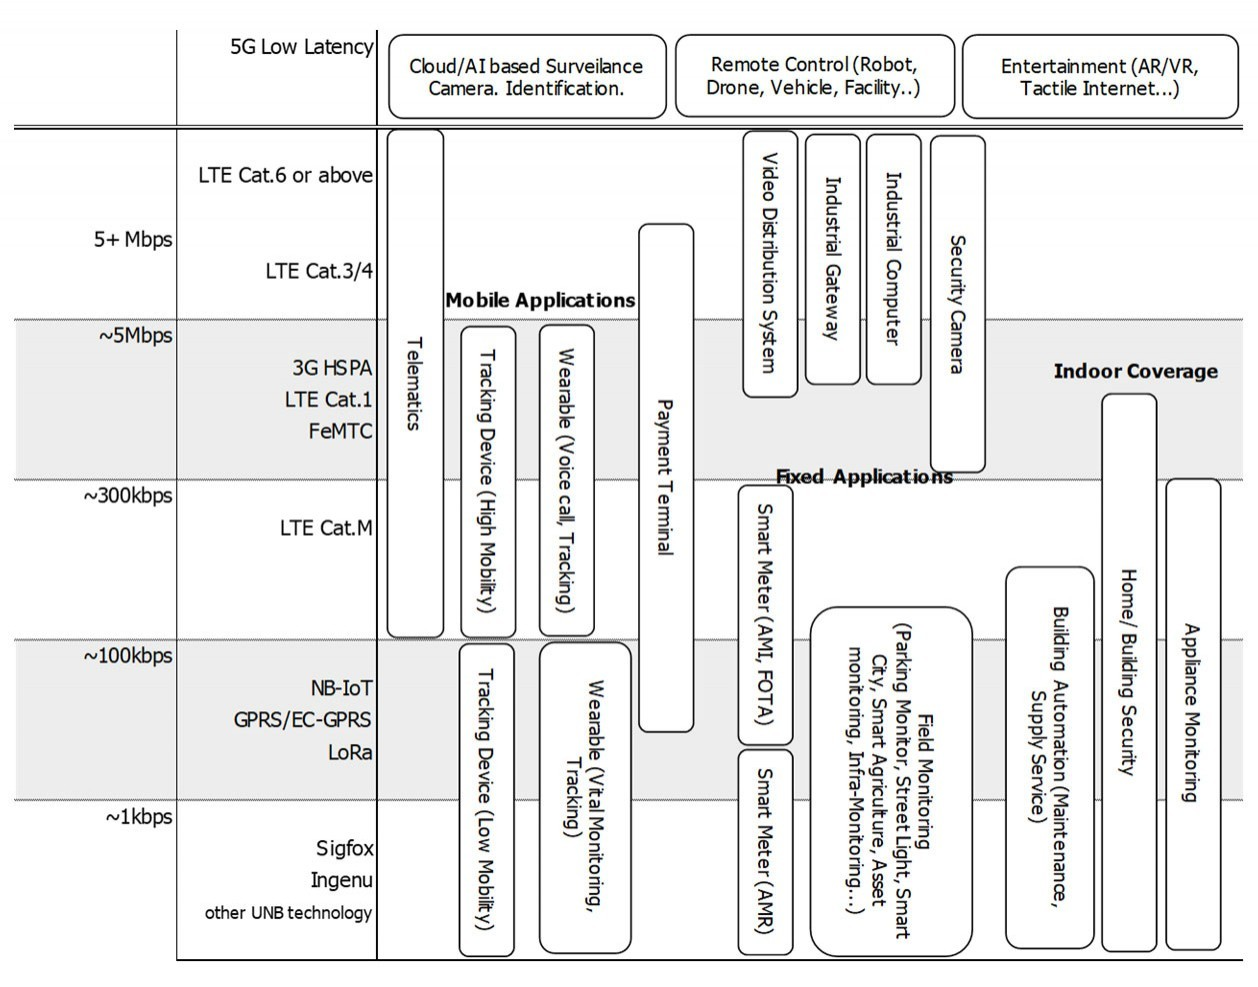 Chart : Matrix of Cellular/LPWA protocol and Application